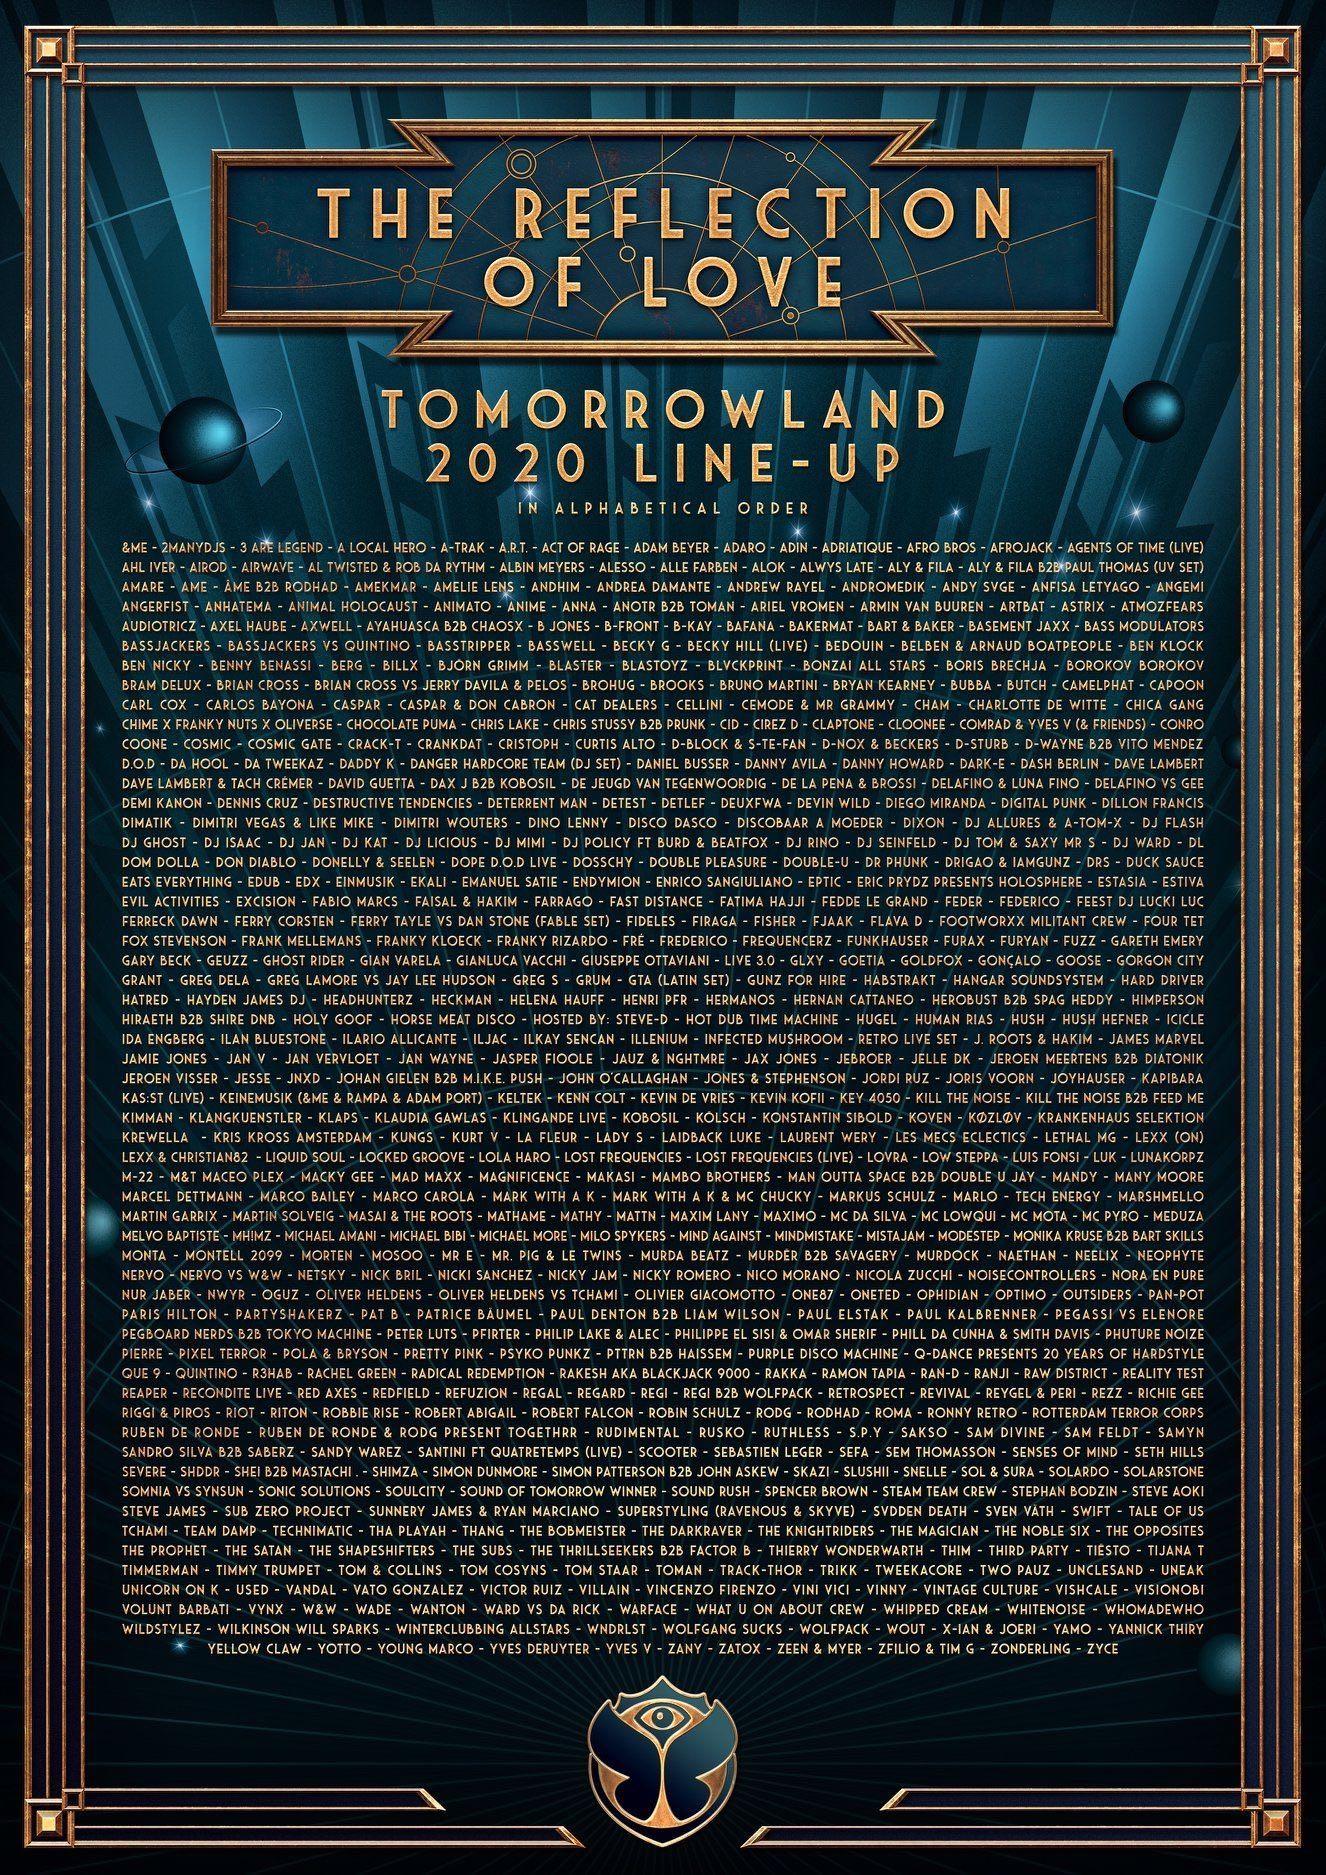 Tomorrowland 2020 Lineup